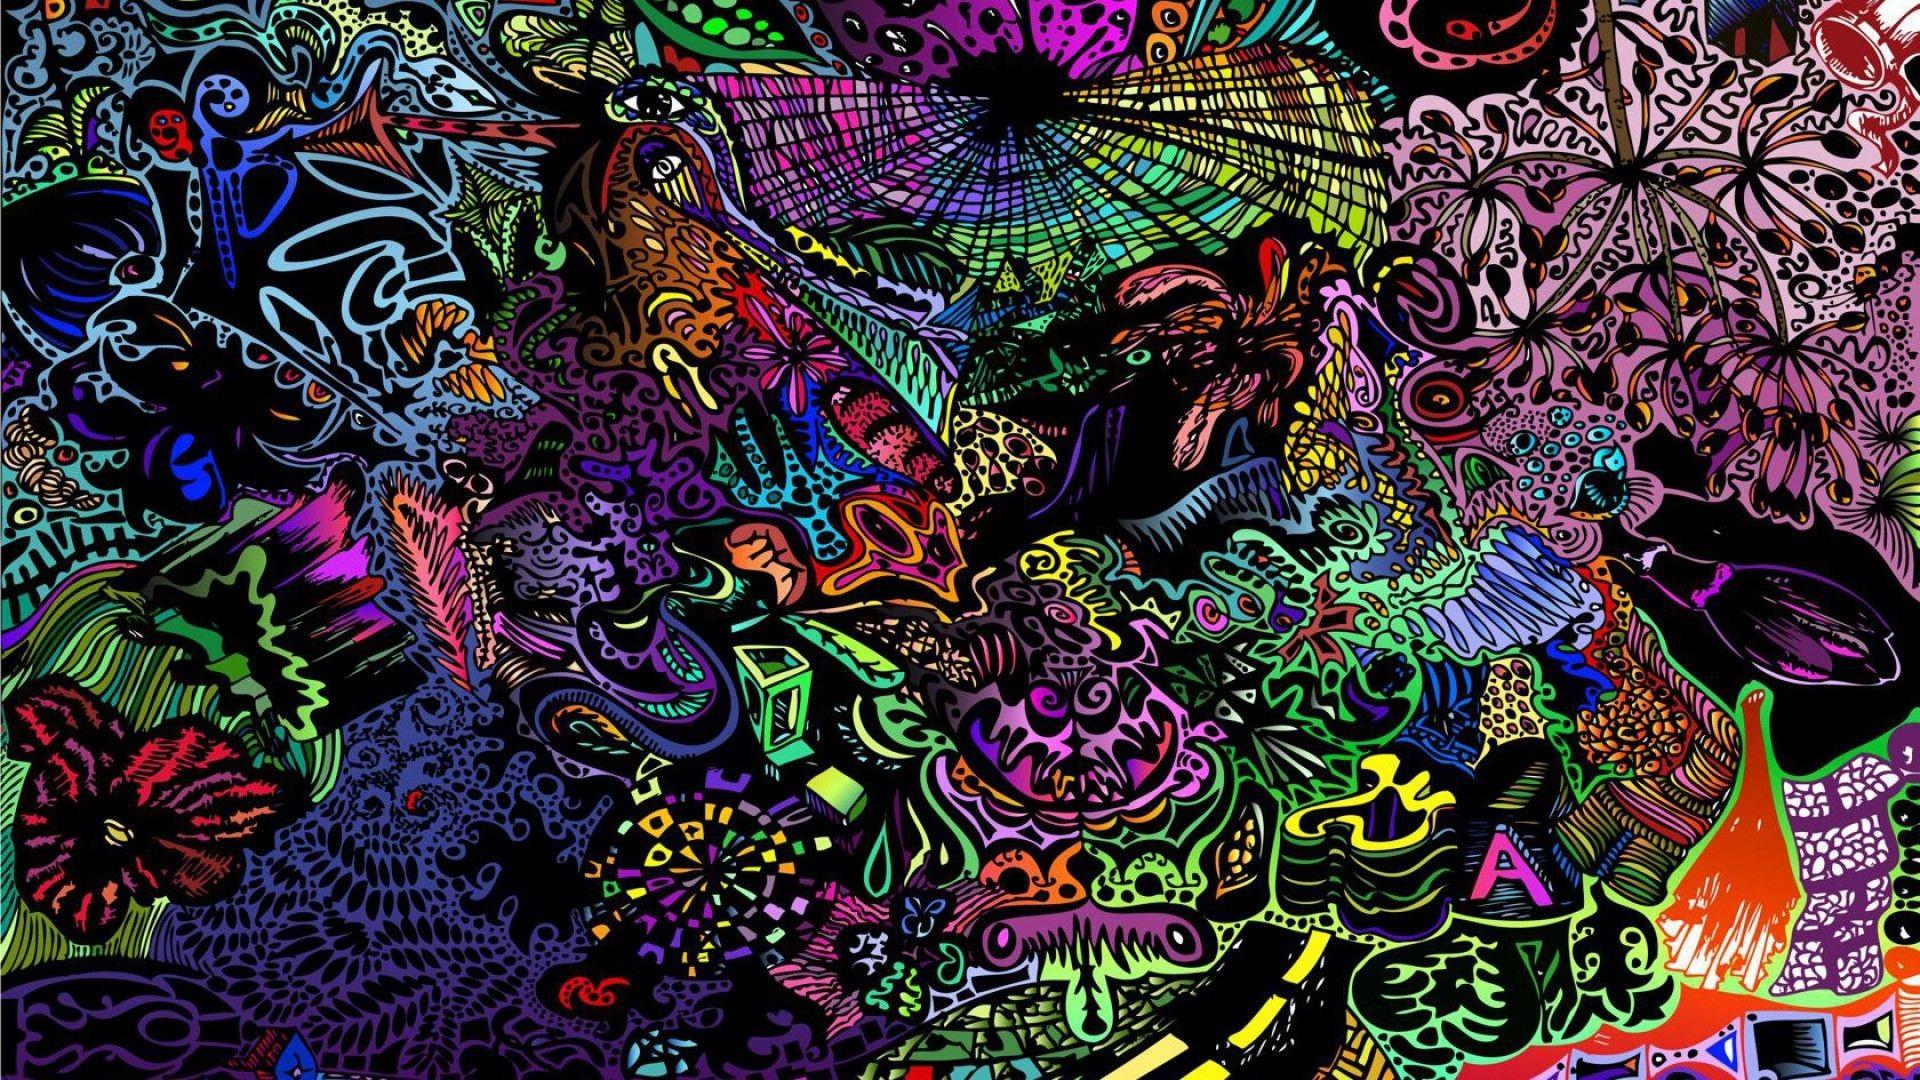 Acid Iphone Wallpaper Sick Trippy Backgrounds 183 ①